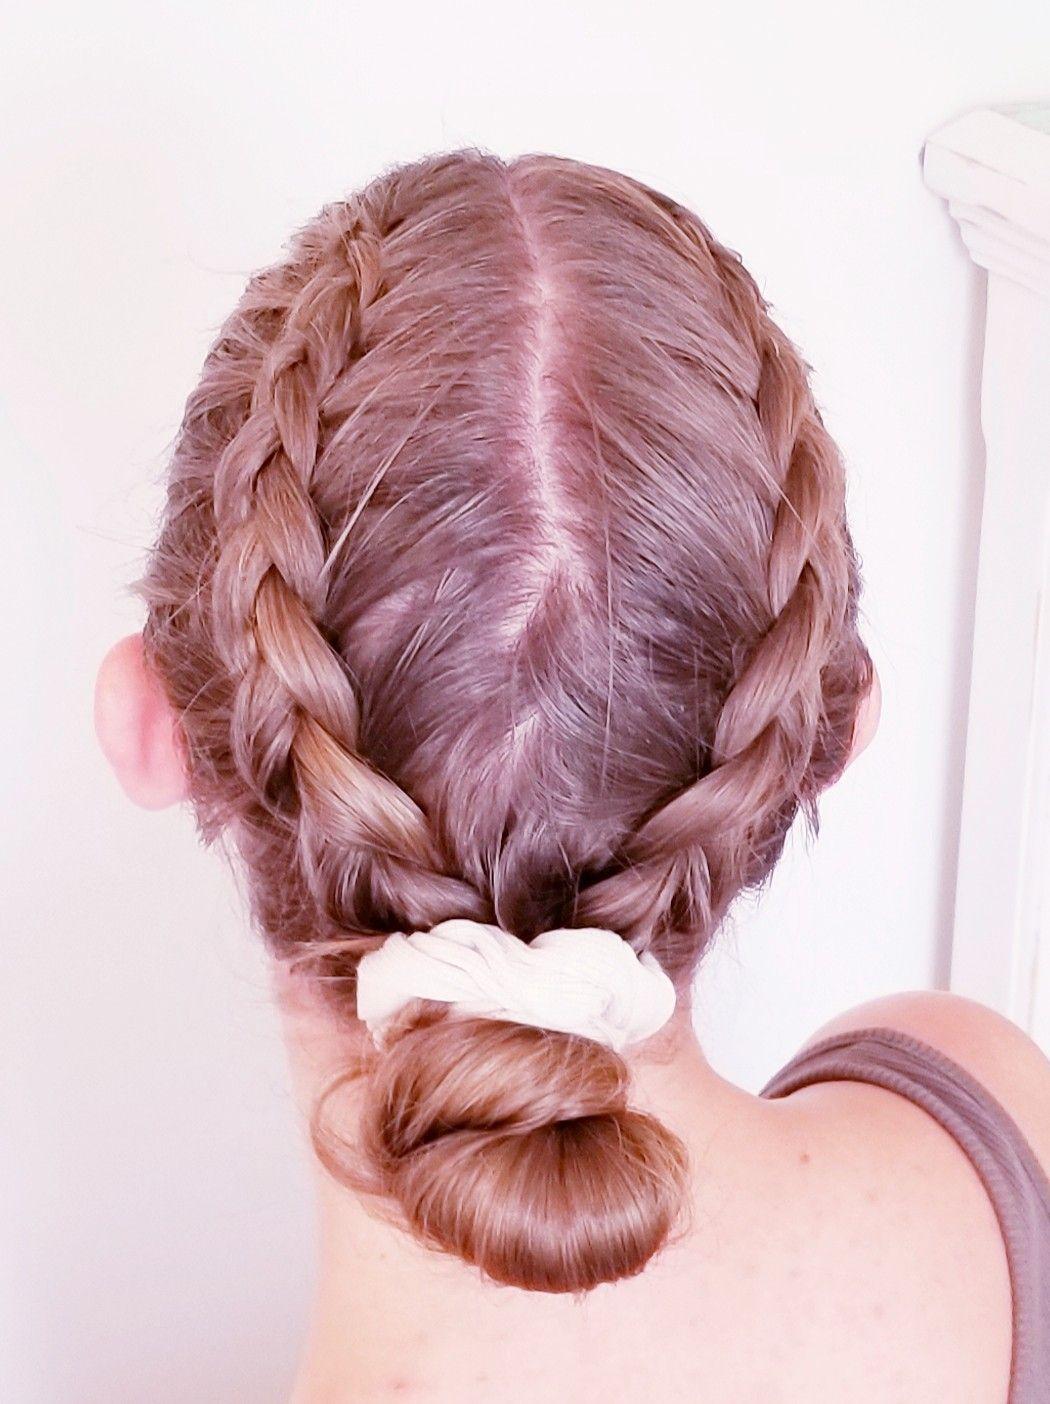 Braids Into Bun In 2020 Lazy Hairstyles Hair Styles Braided Bun